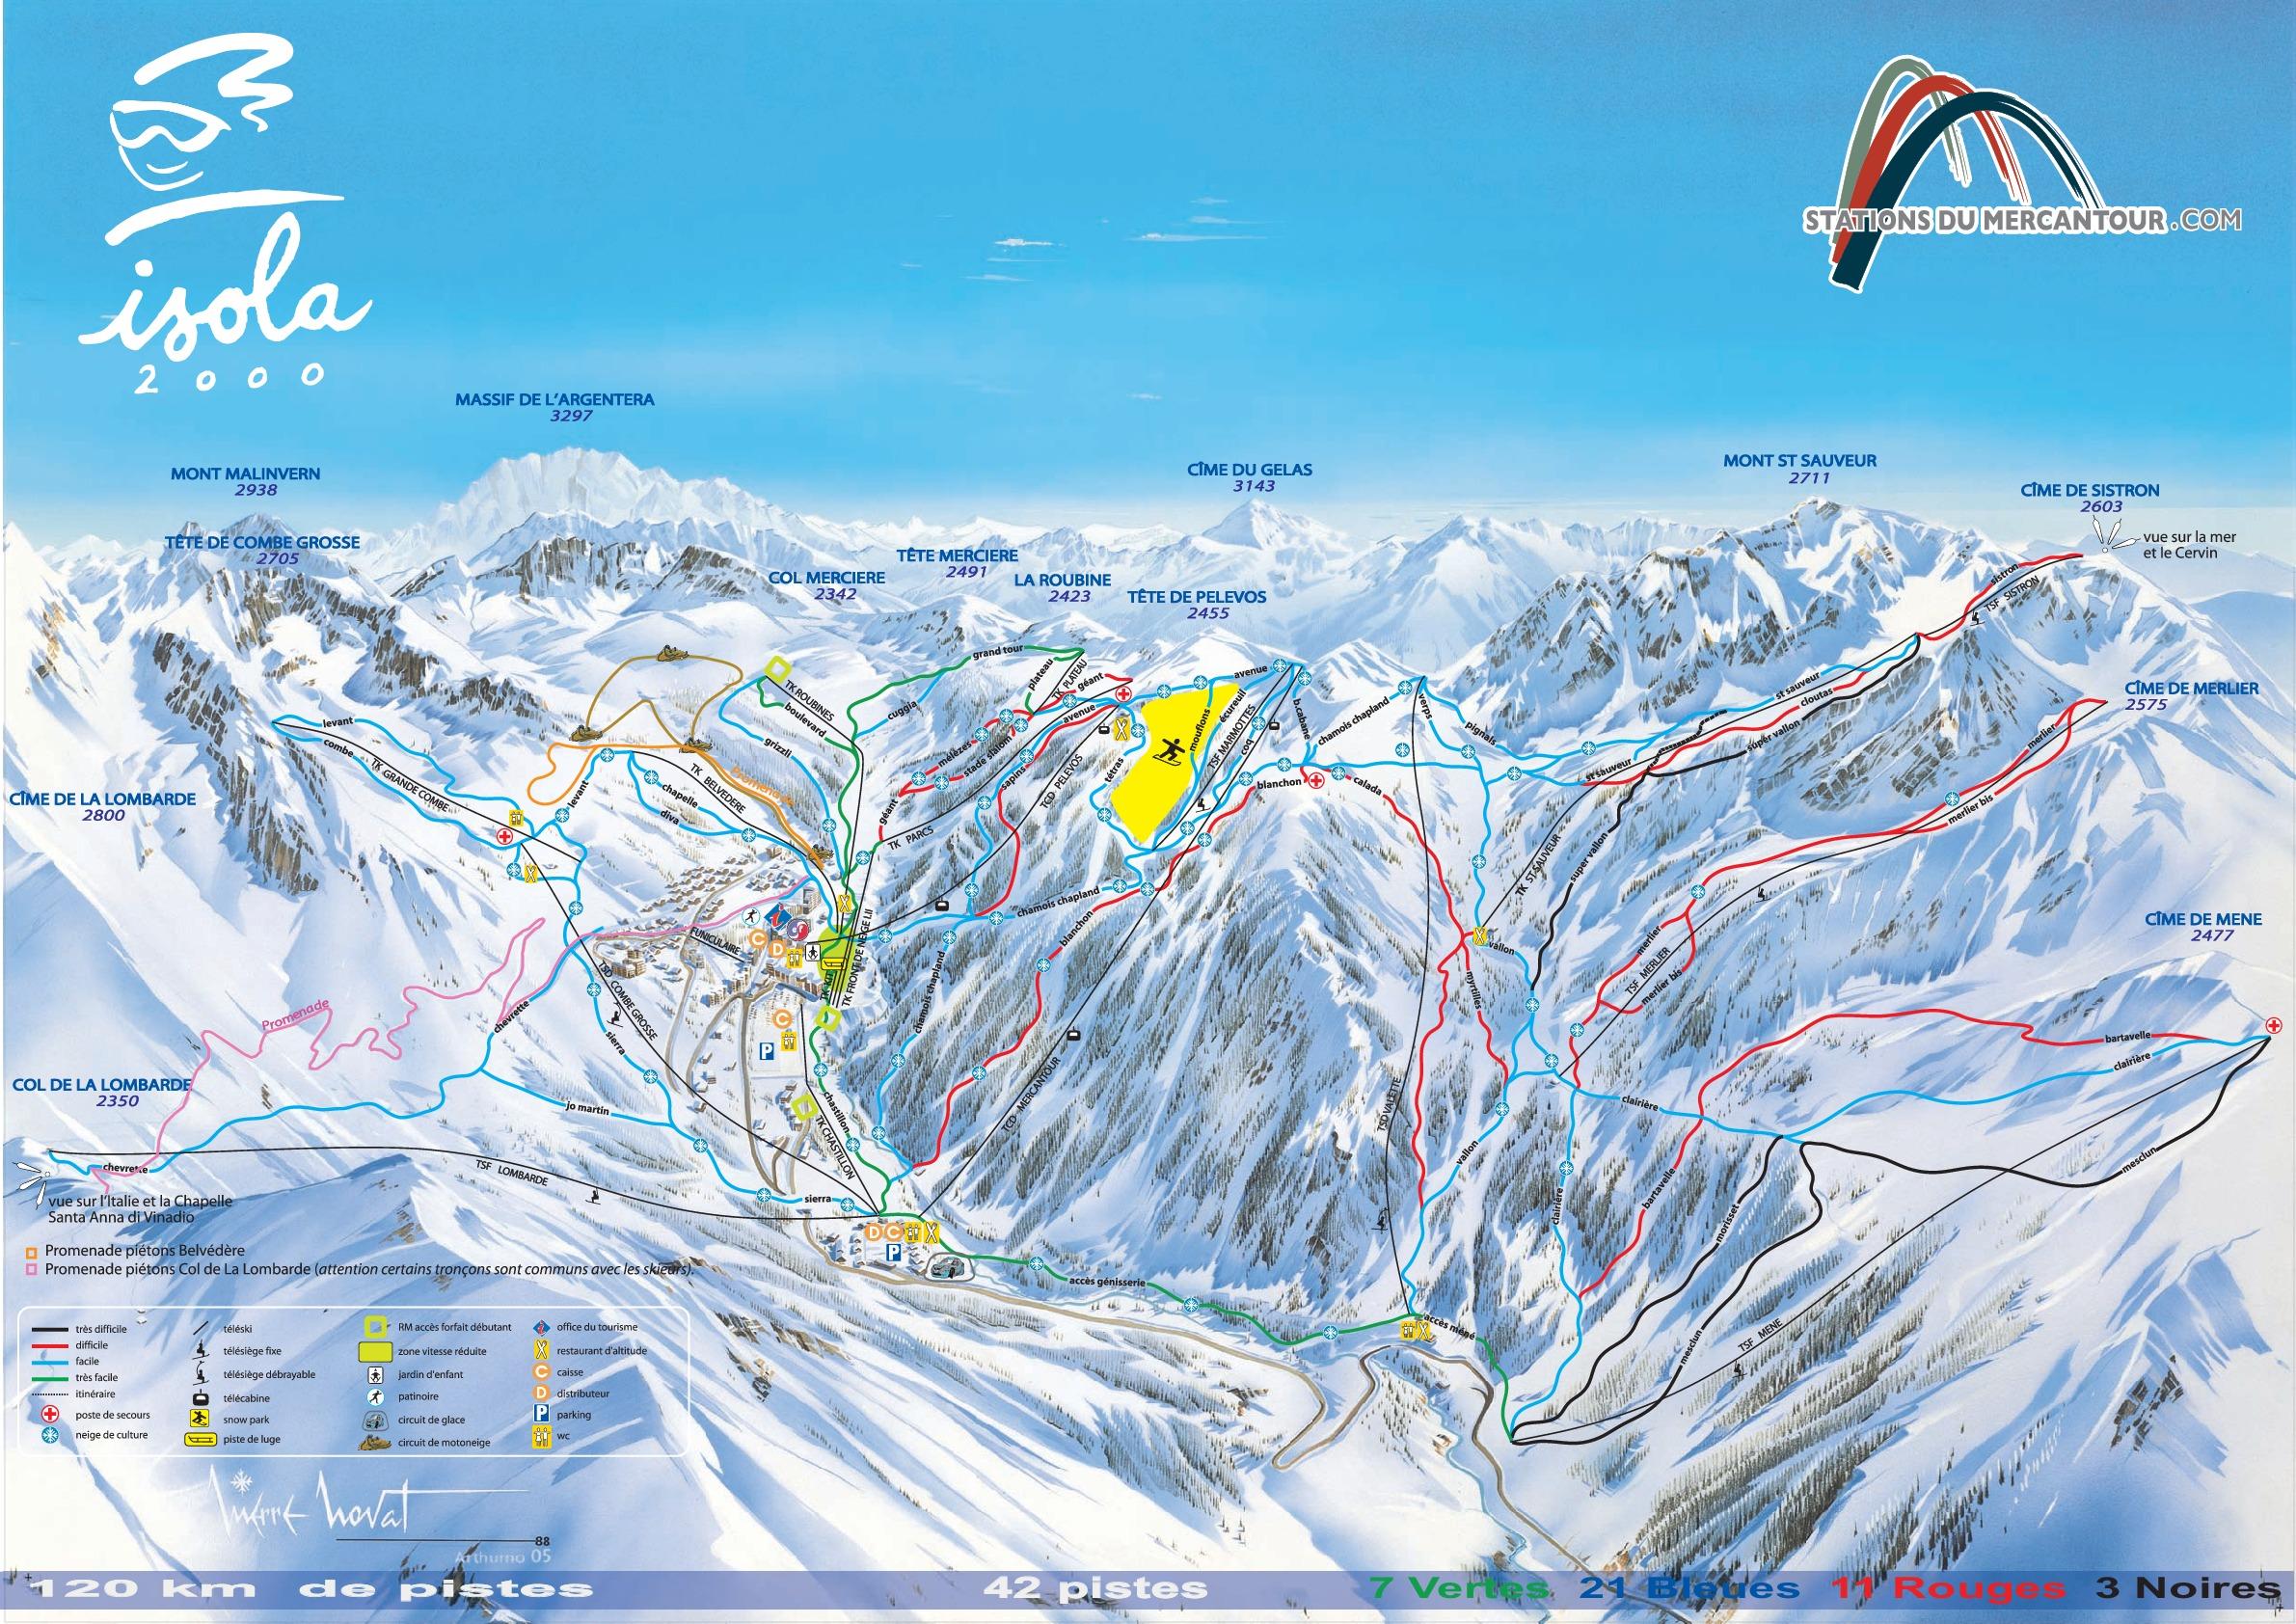 Isola 2000 Ski Resort France Ski Line